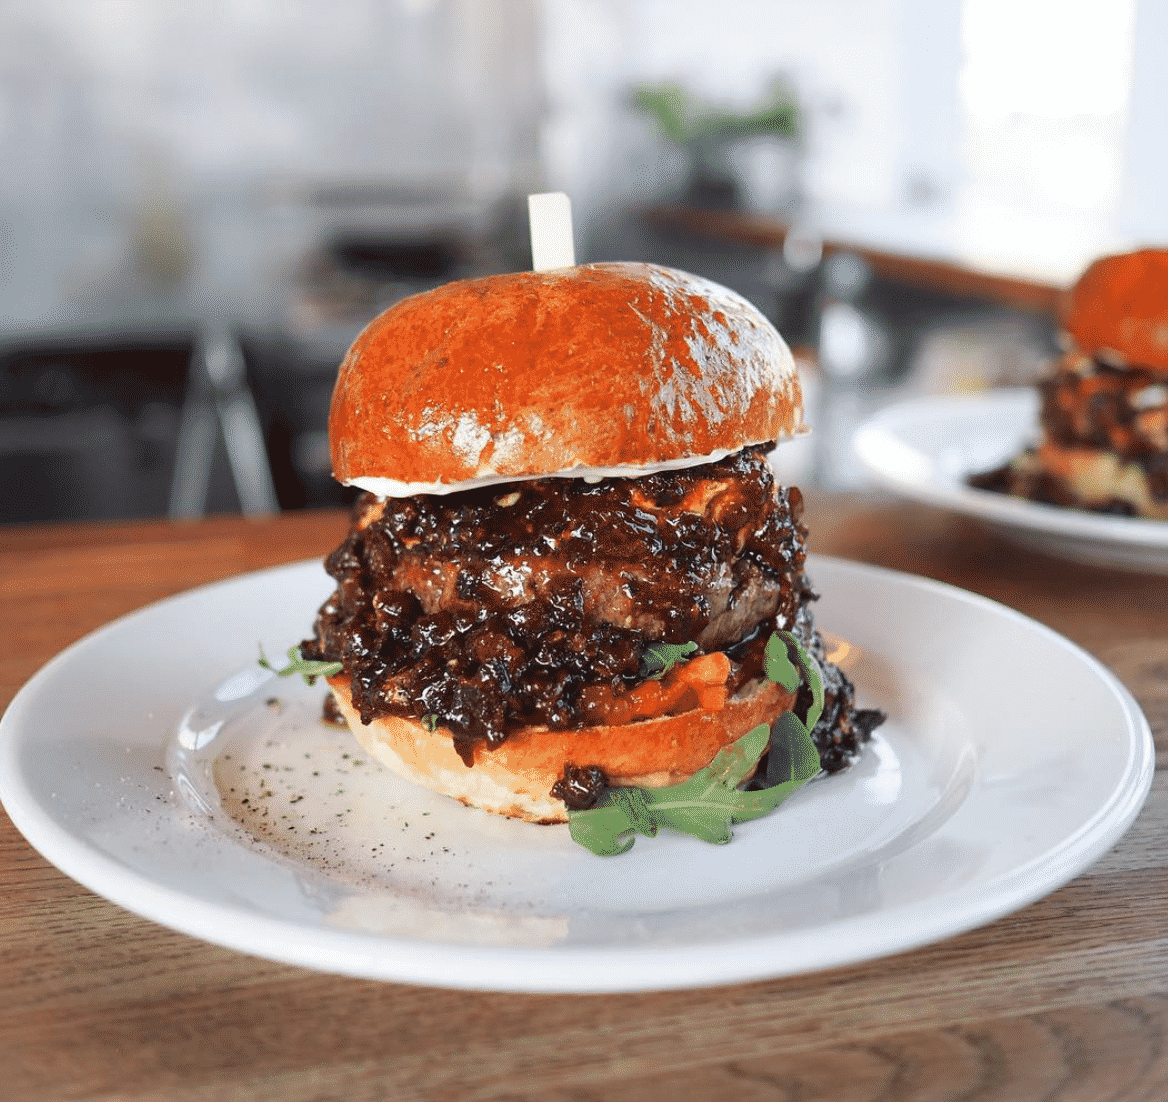 Warsaw burgers